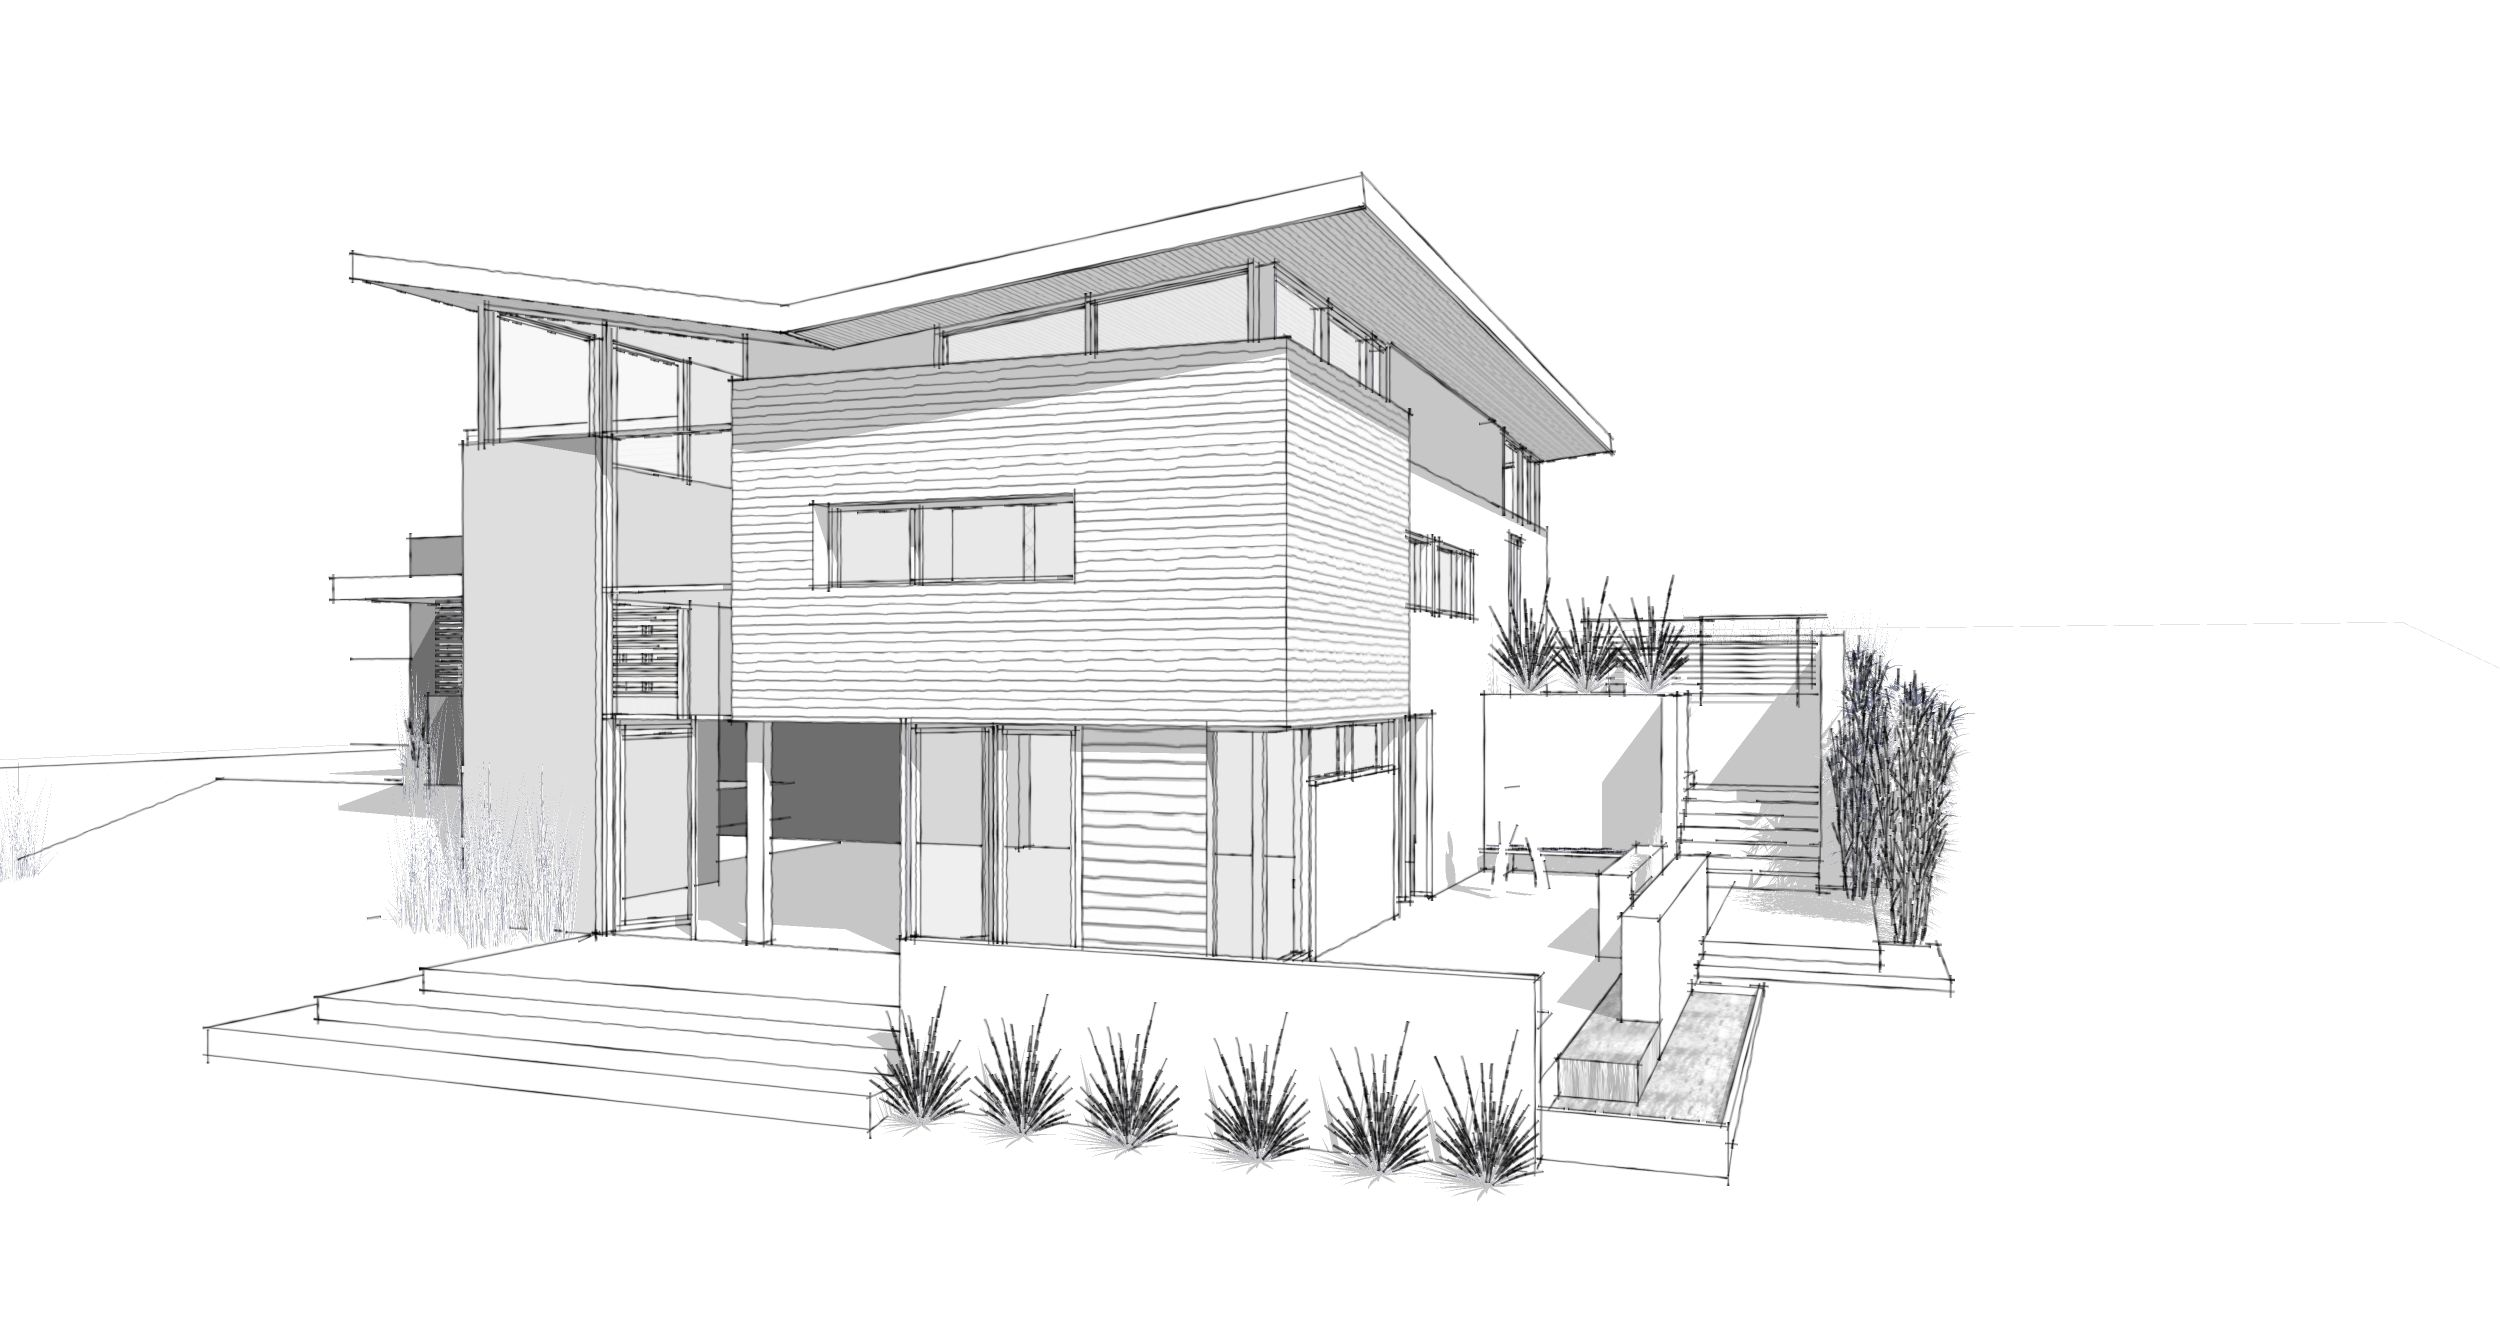 Modern Home Architecture Sketches Design Ideas 13435 ...